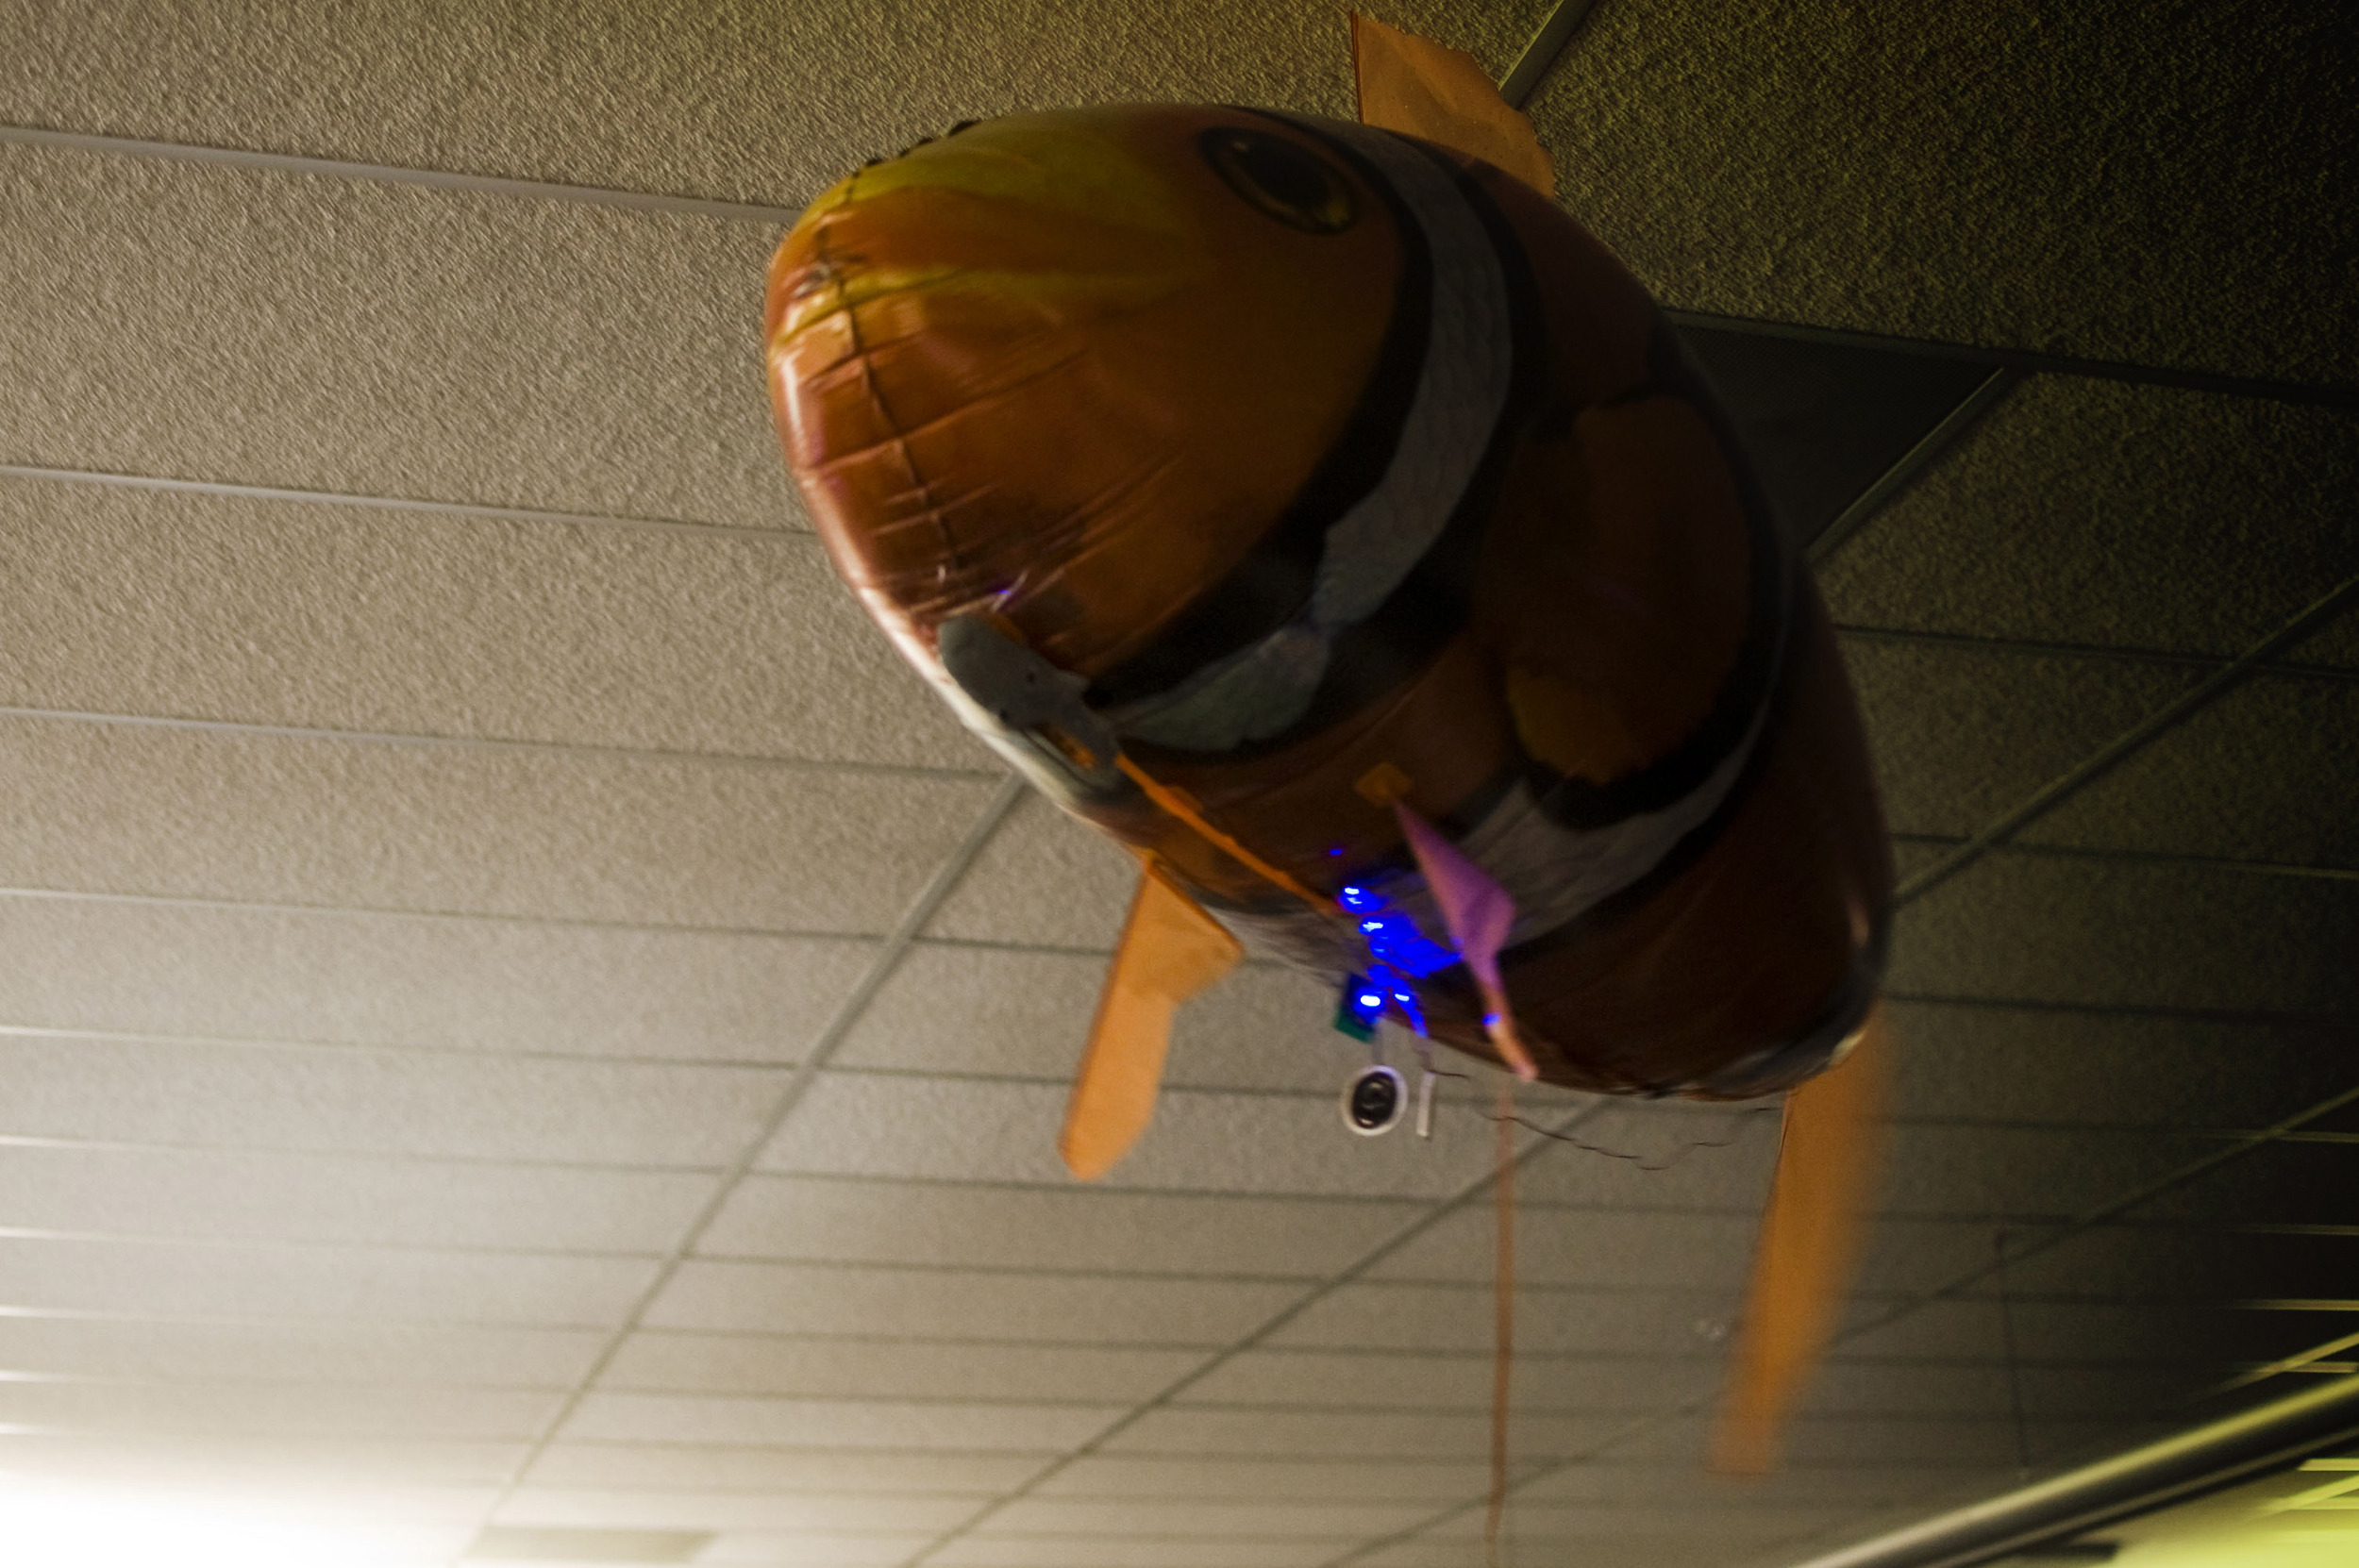 BT songfish explores empty cubicles 1